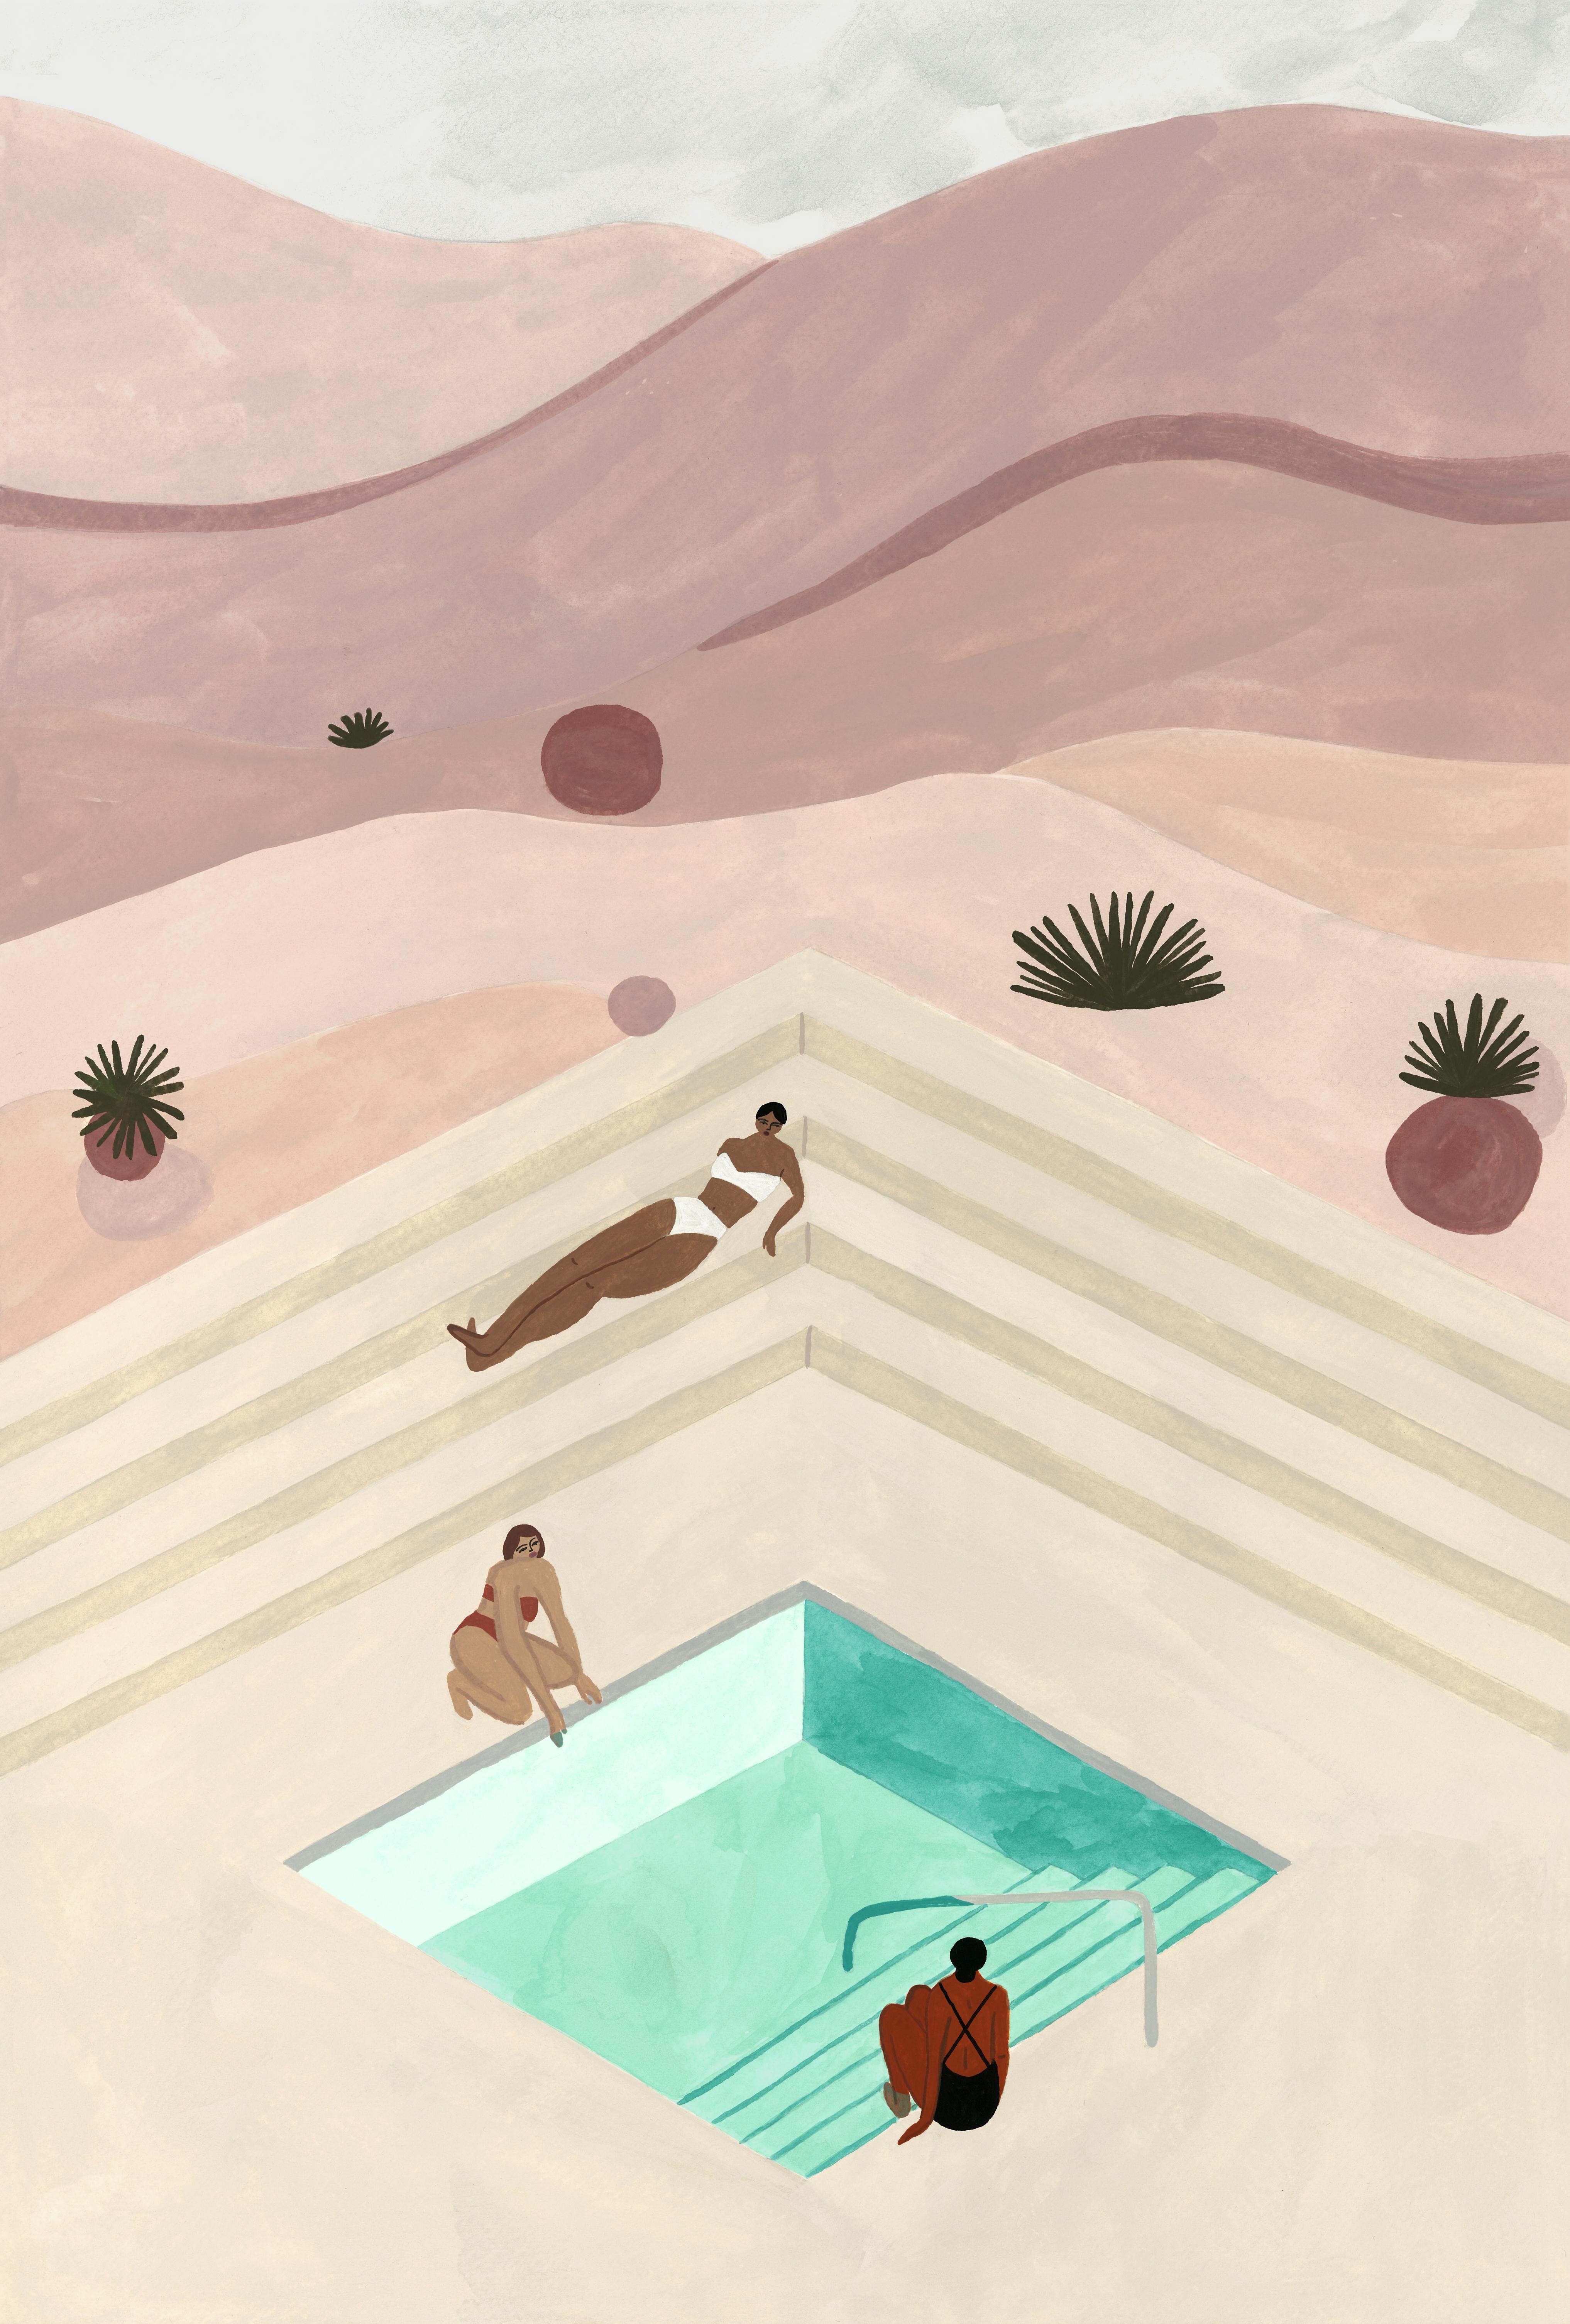 Amangiri by Isabelle Feliu